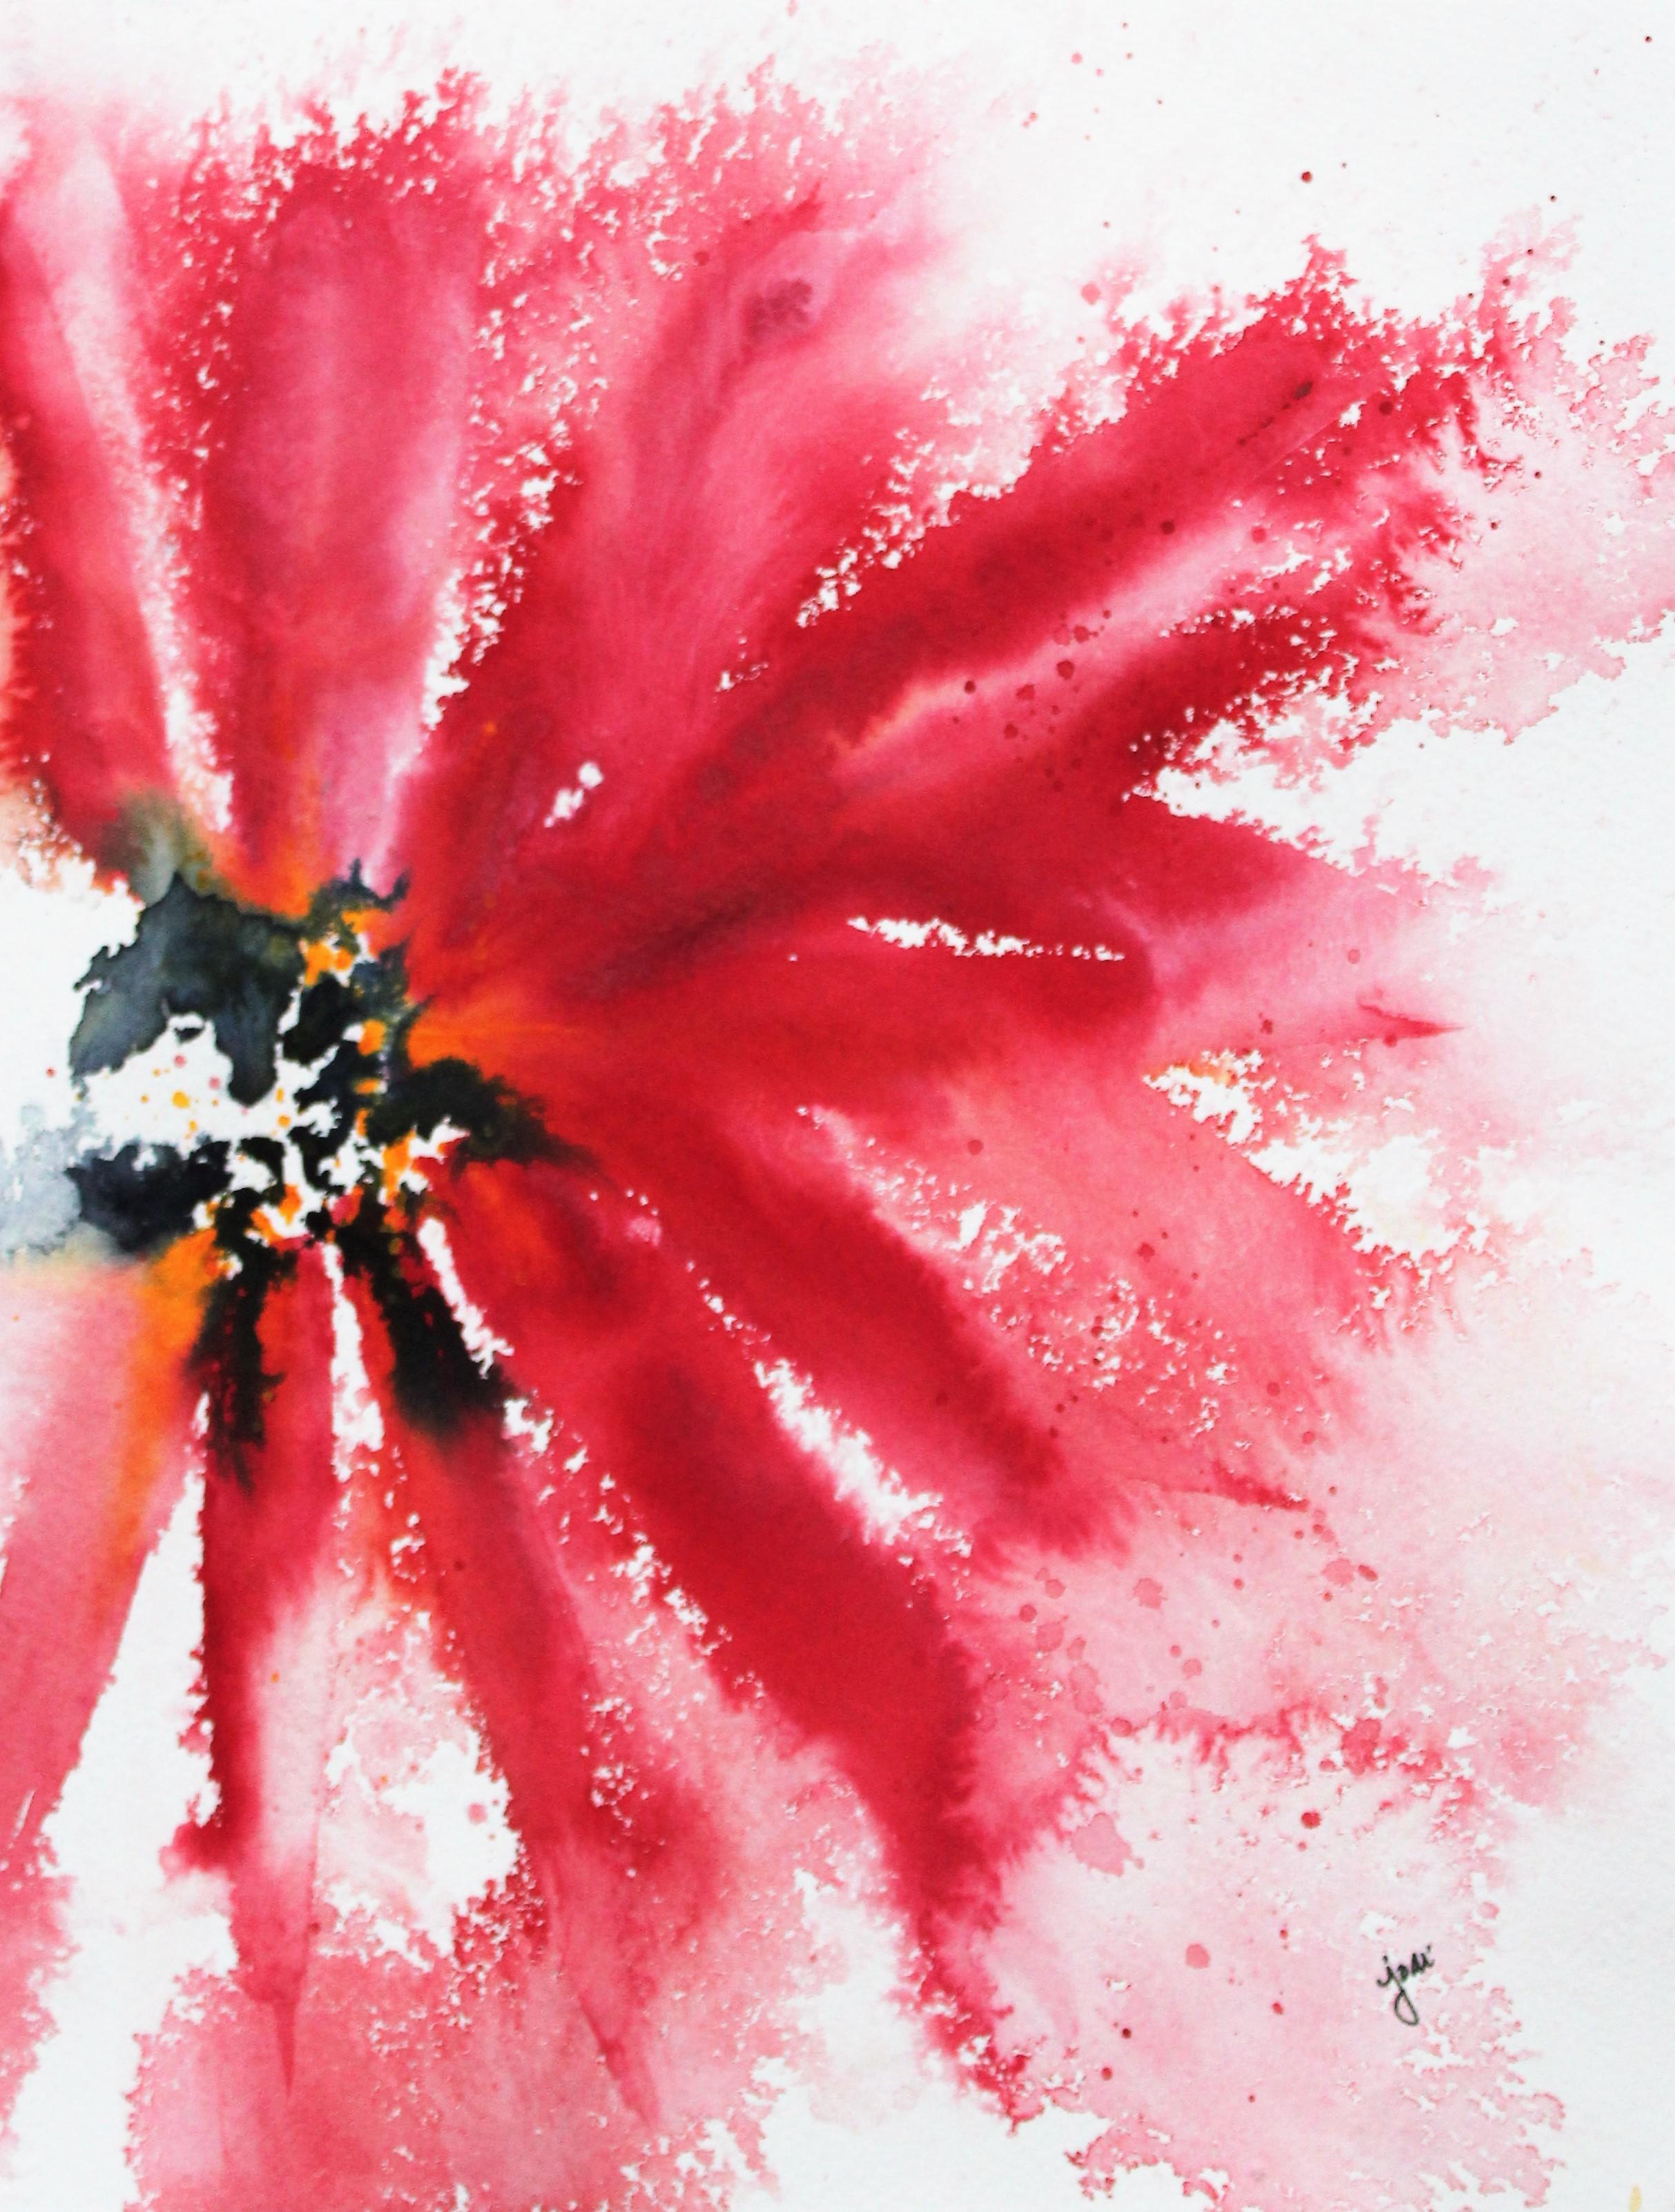 Watercolor   the creative life in between